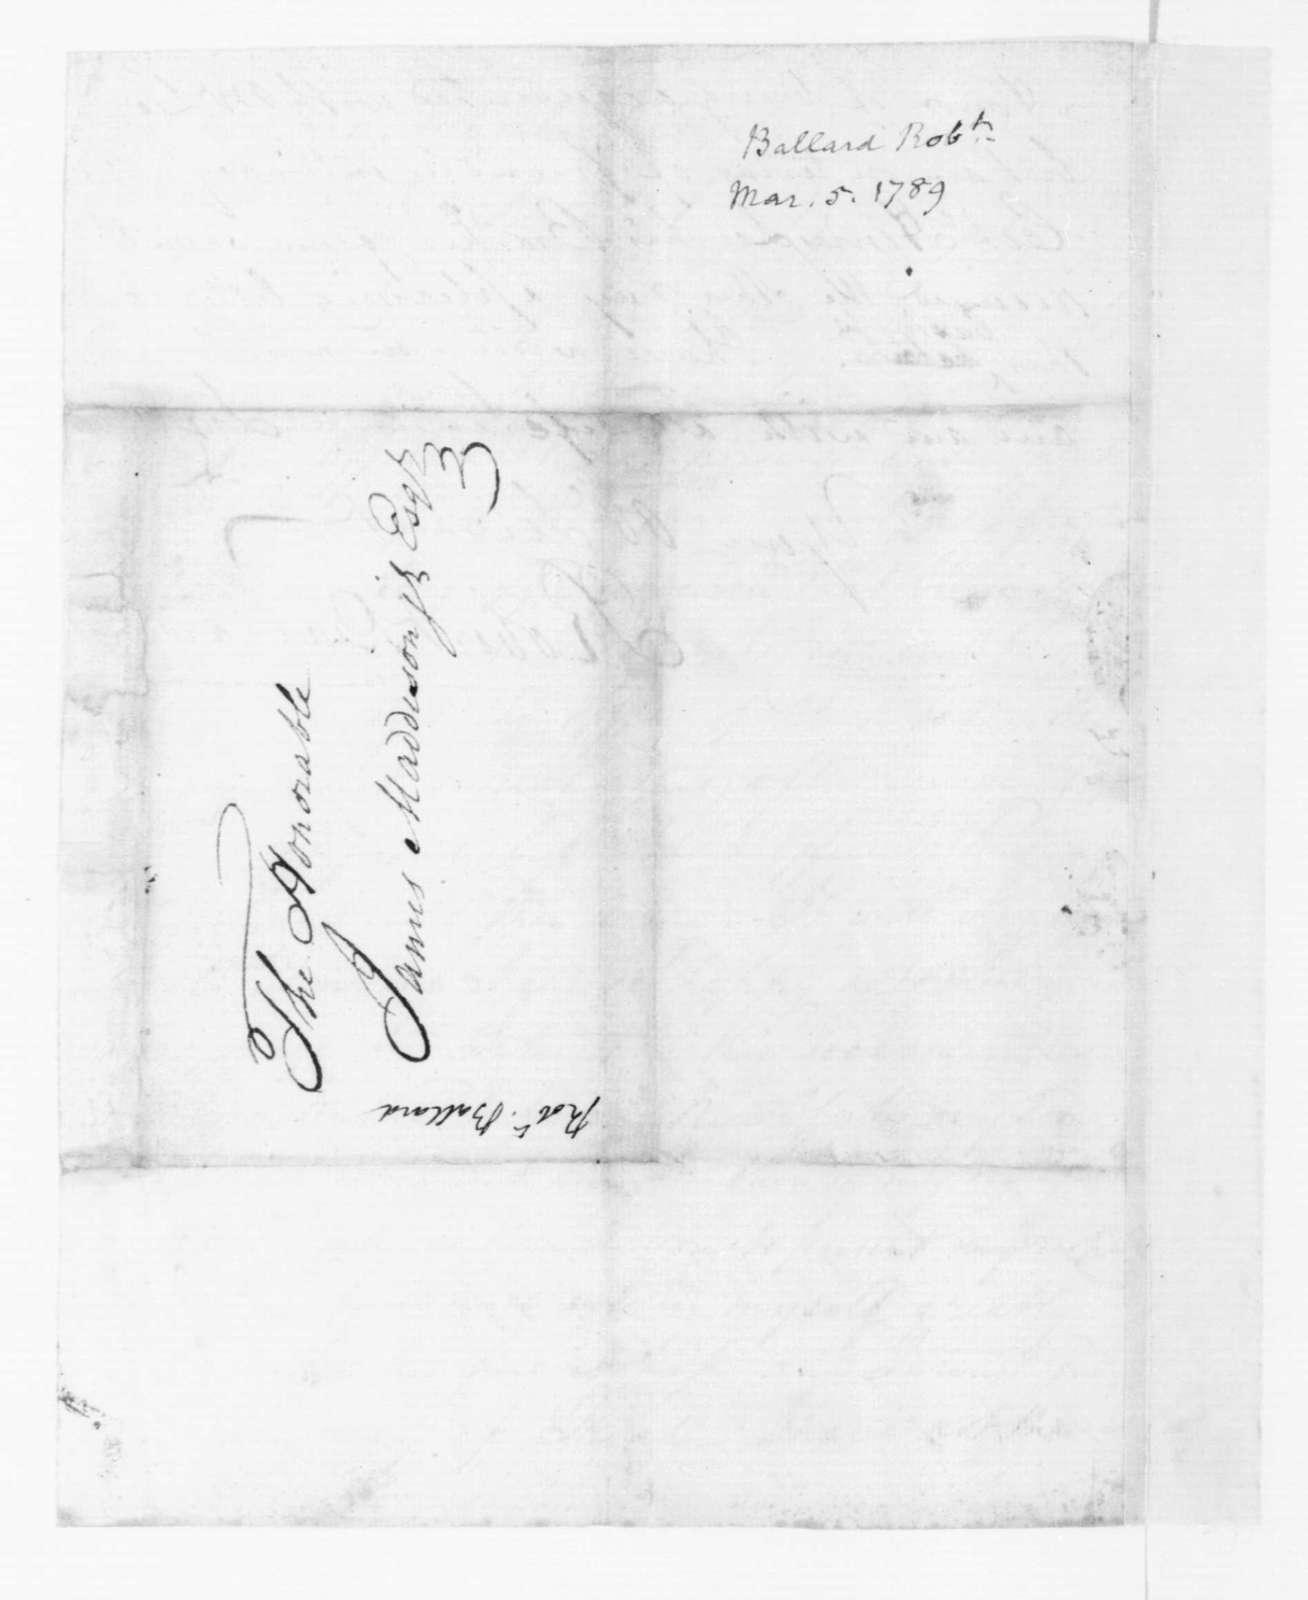 Robert Ballard to James Madison, March 5, 1789.